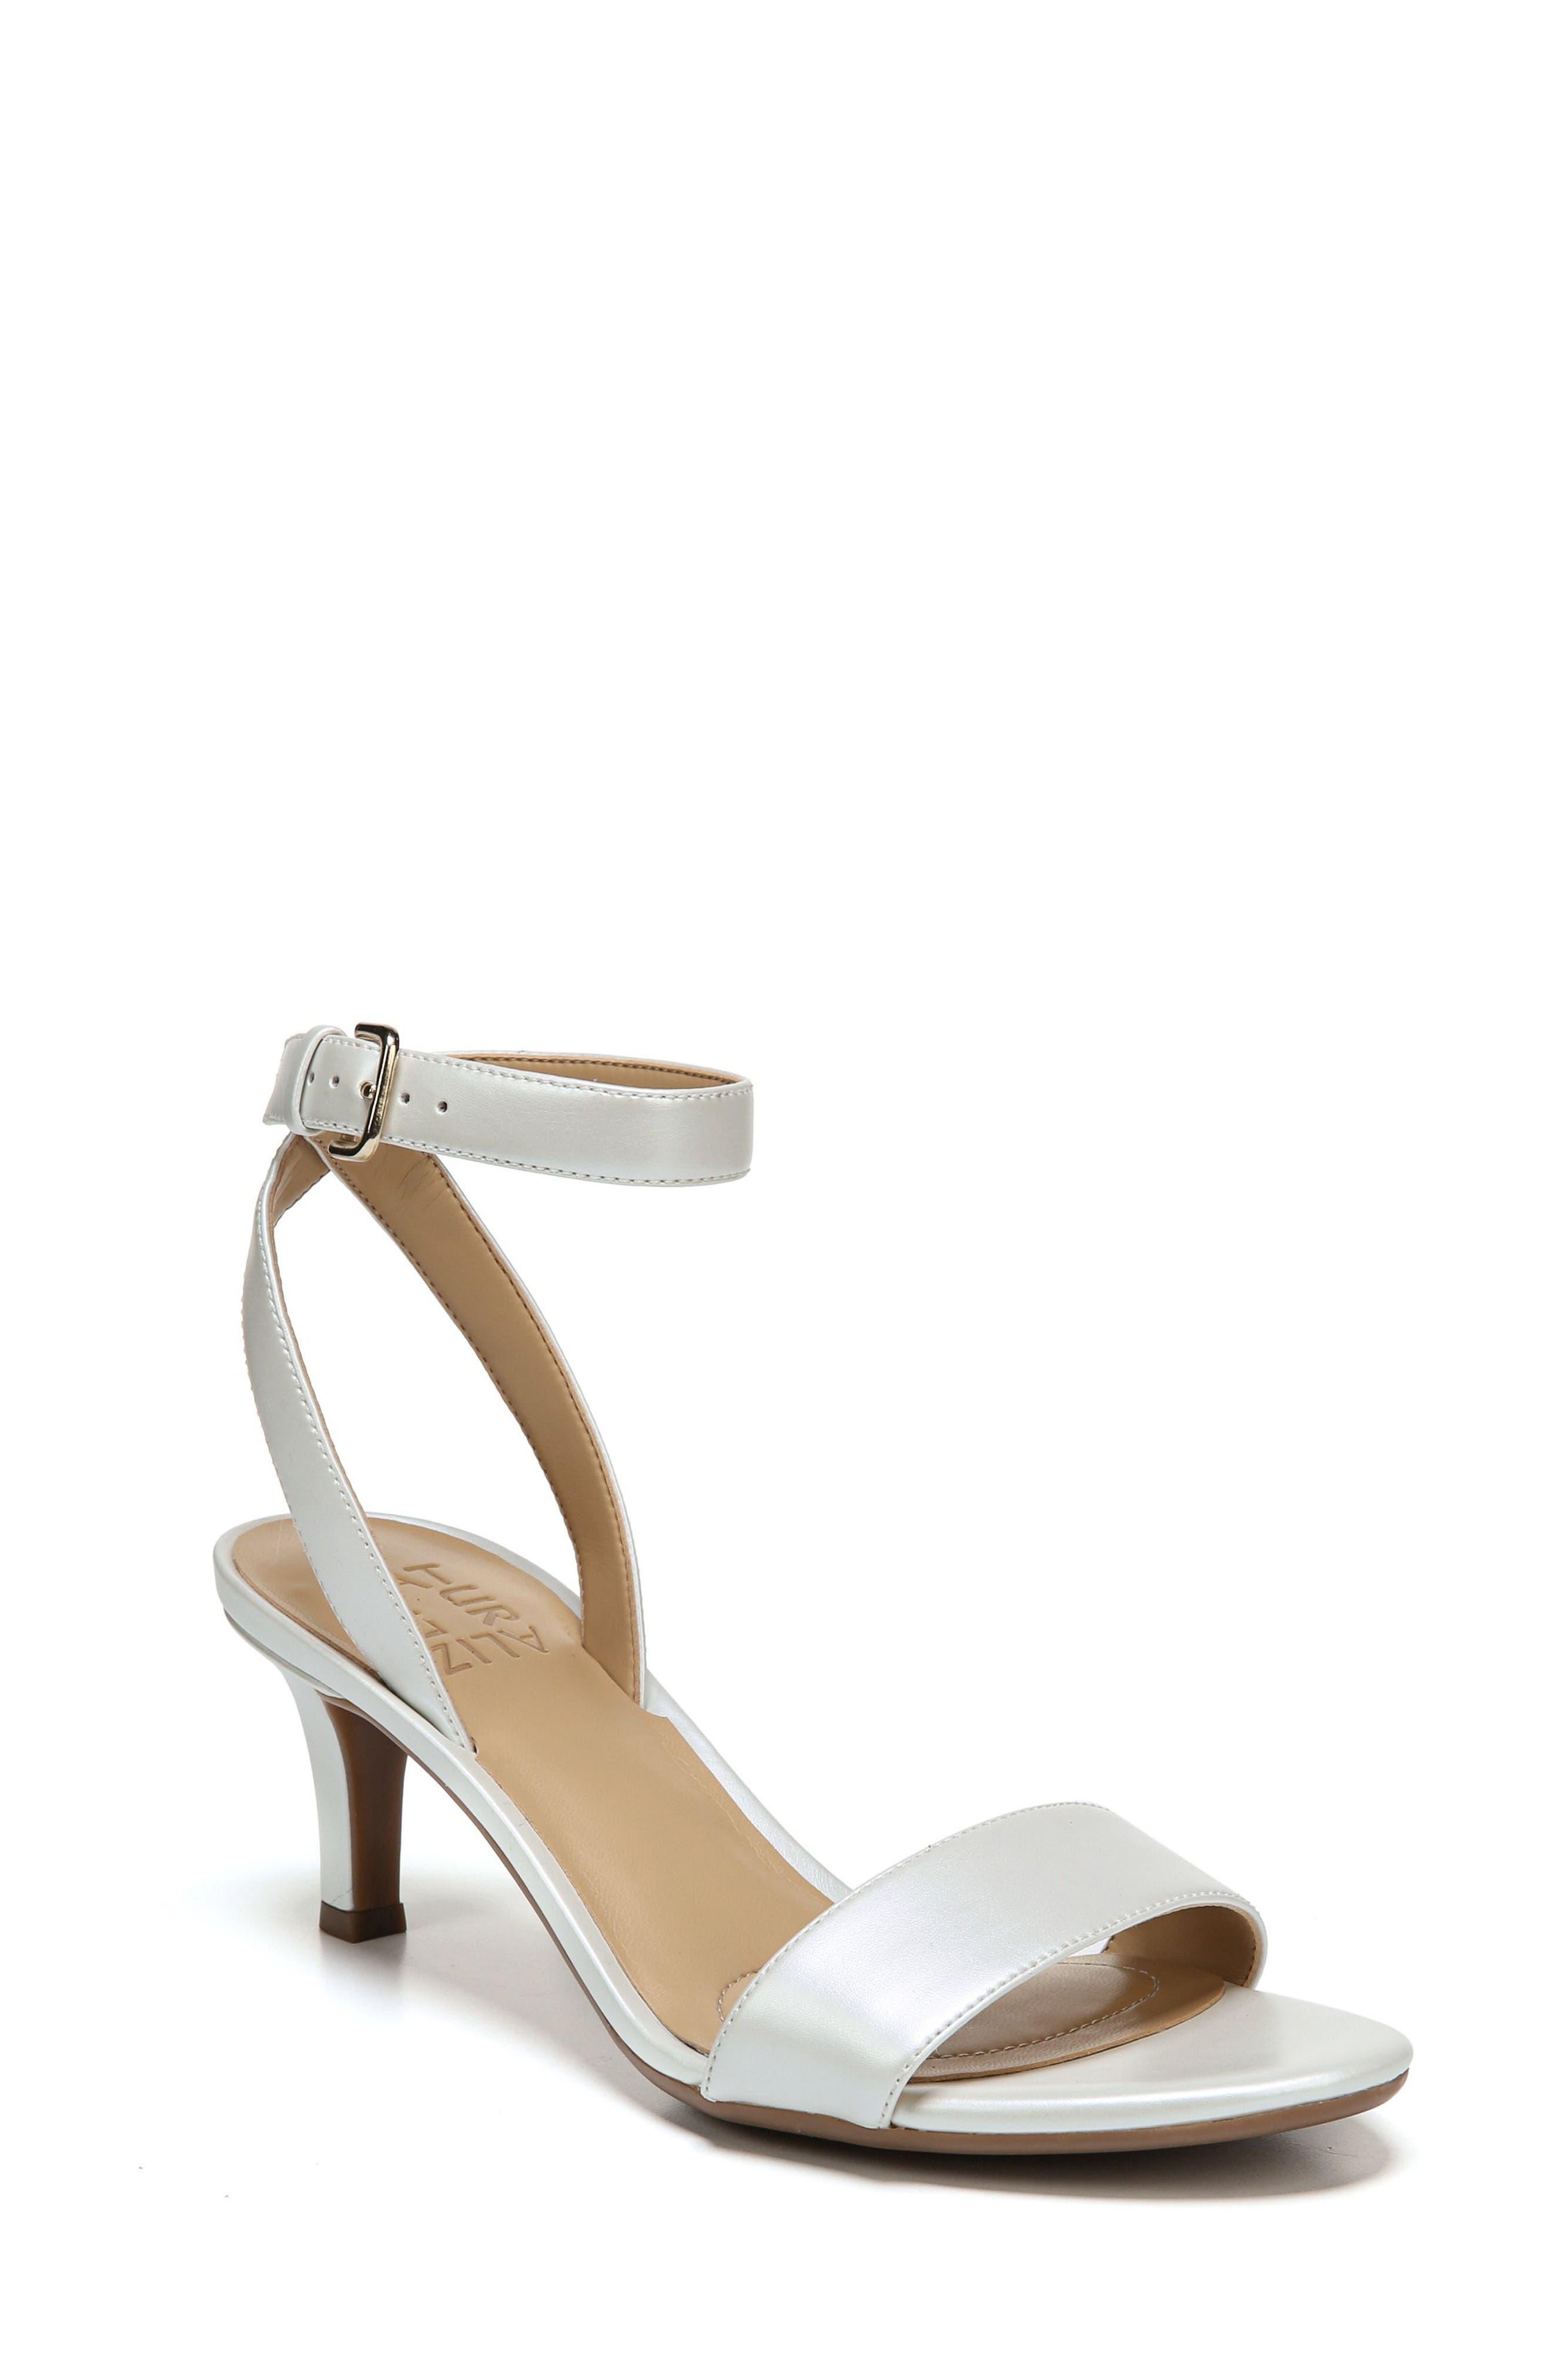 NATURALIZER Tinda Sandal, Main, color, WHITE LEATHER